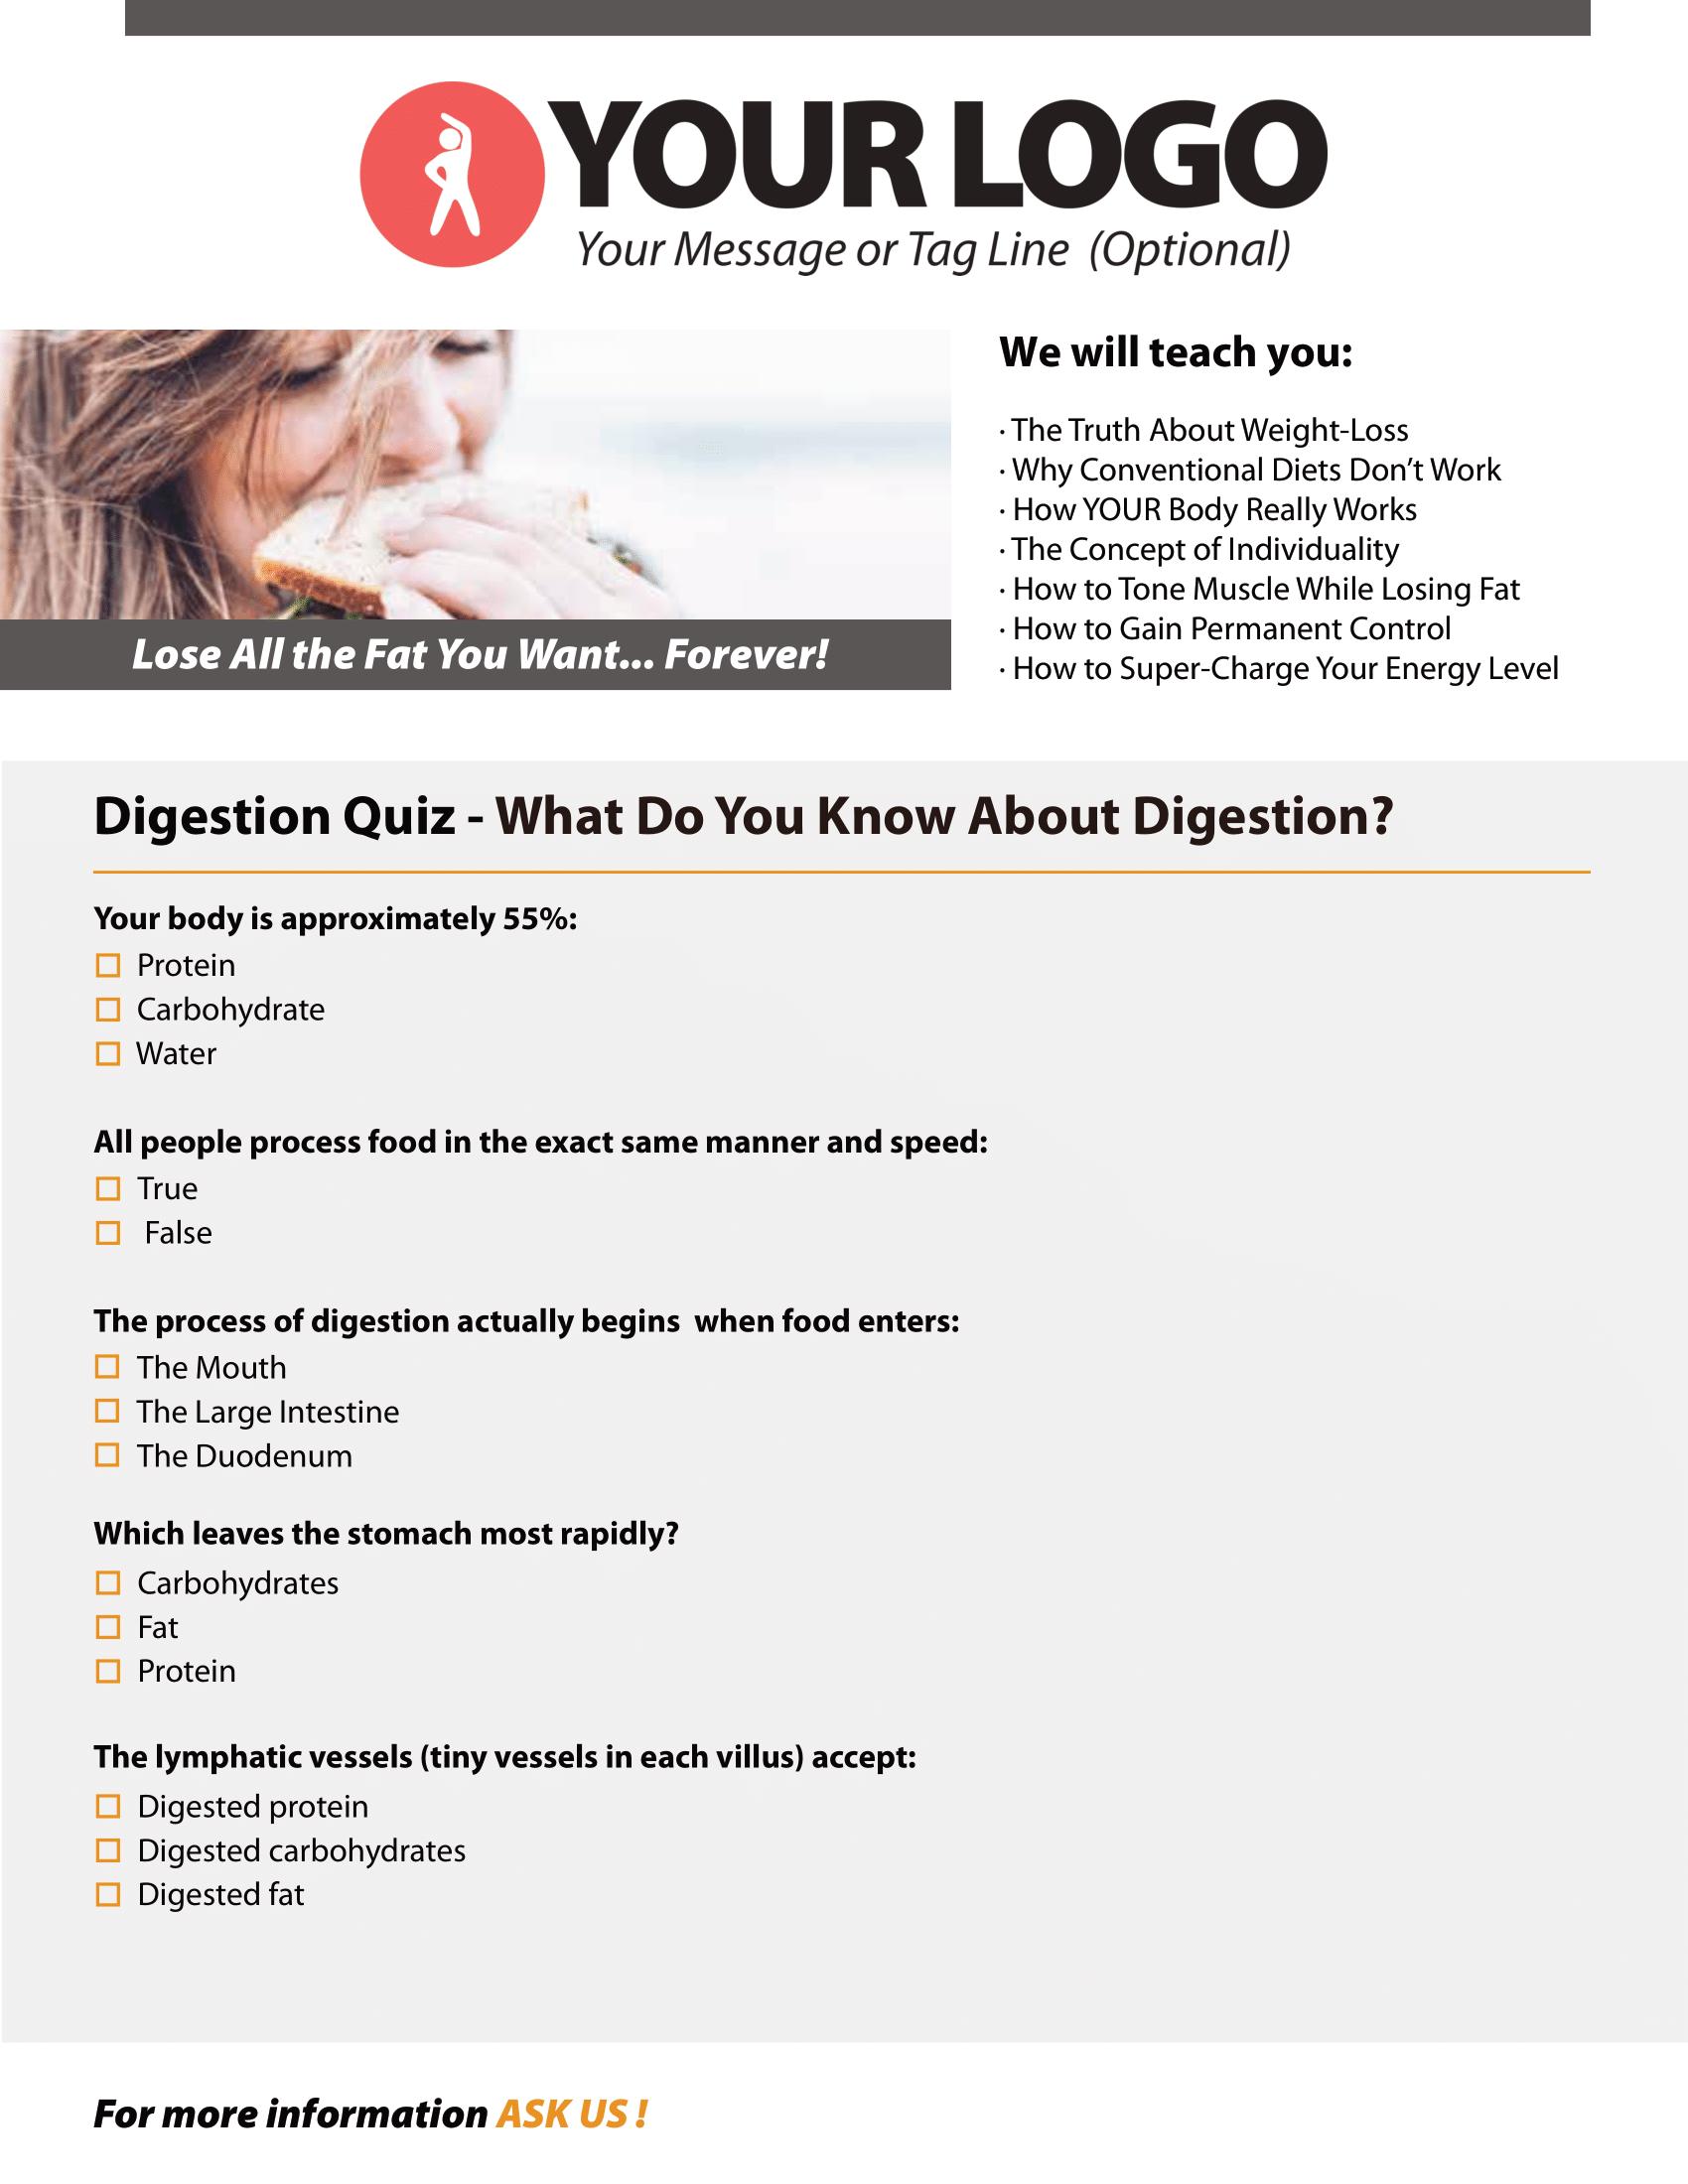 YOUR_LOGO_Quiz02_WE-1